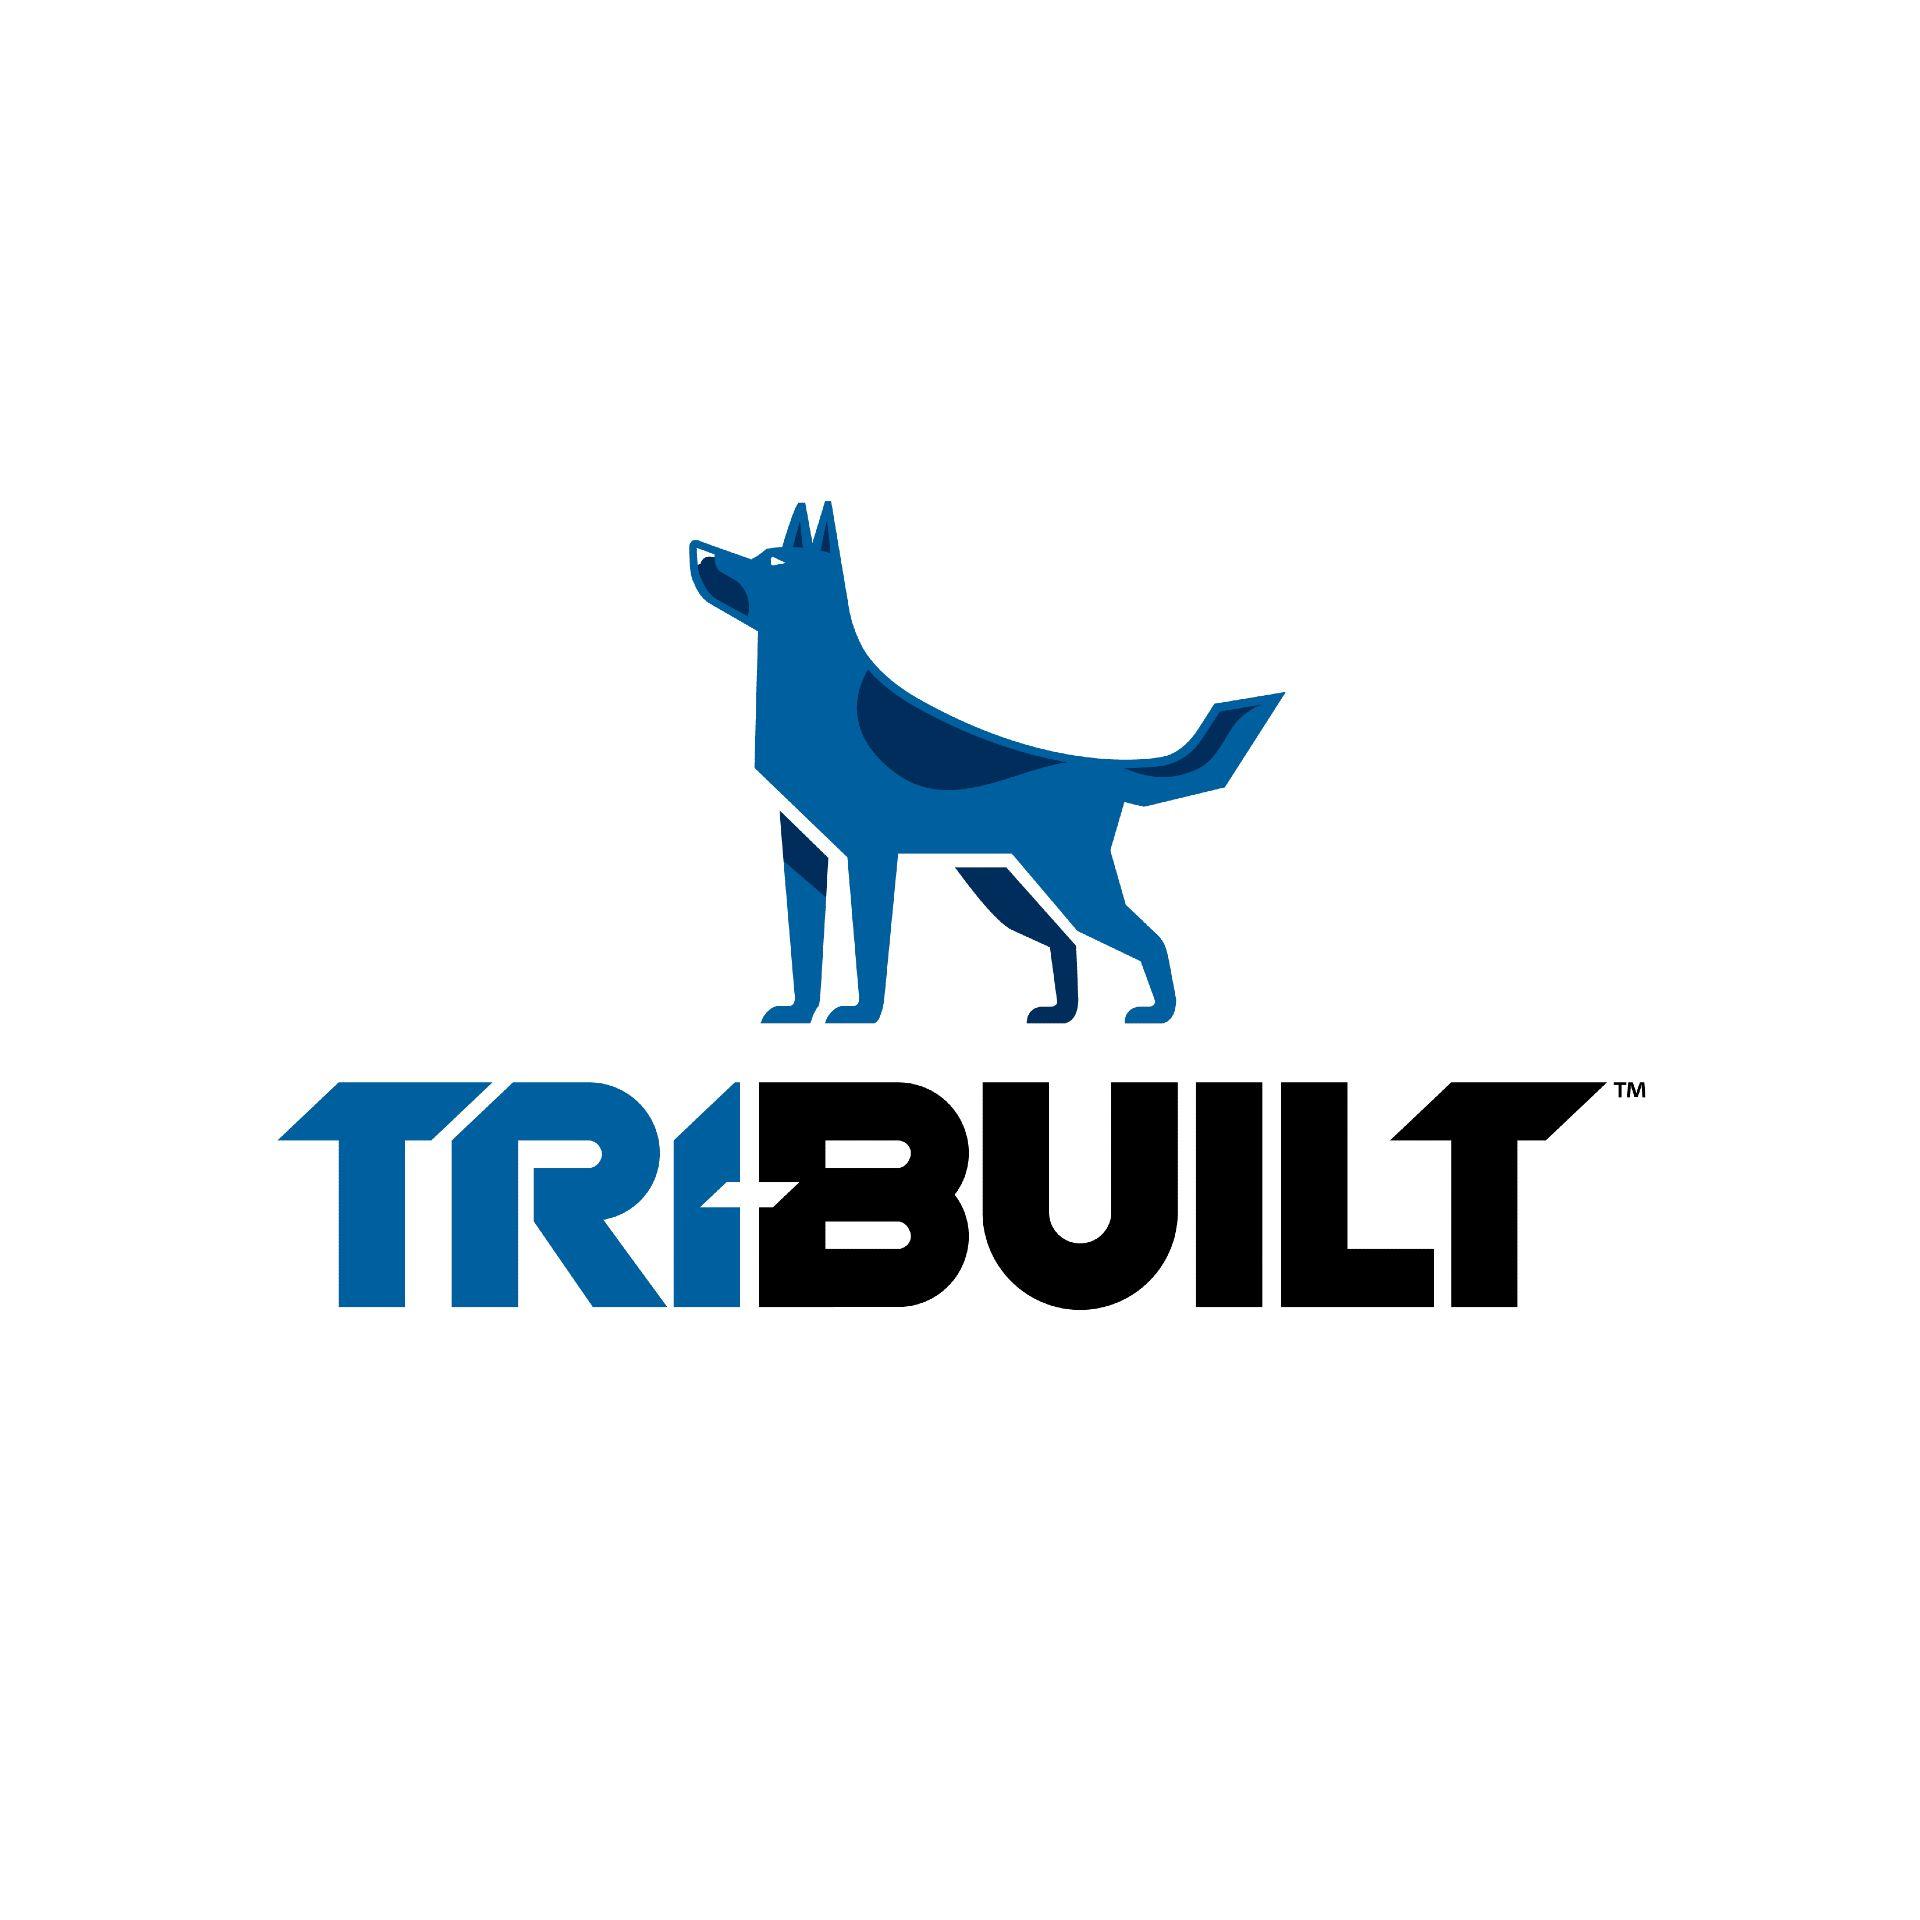 "TRI-BUILT 24"" x 50' Aluminum Trim Coil - Two-Sided White/White"